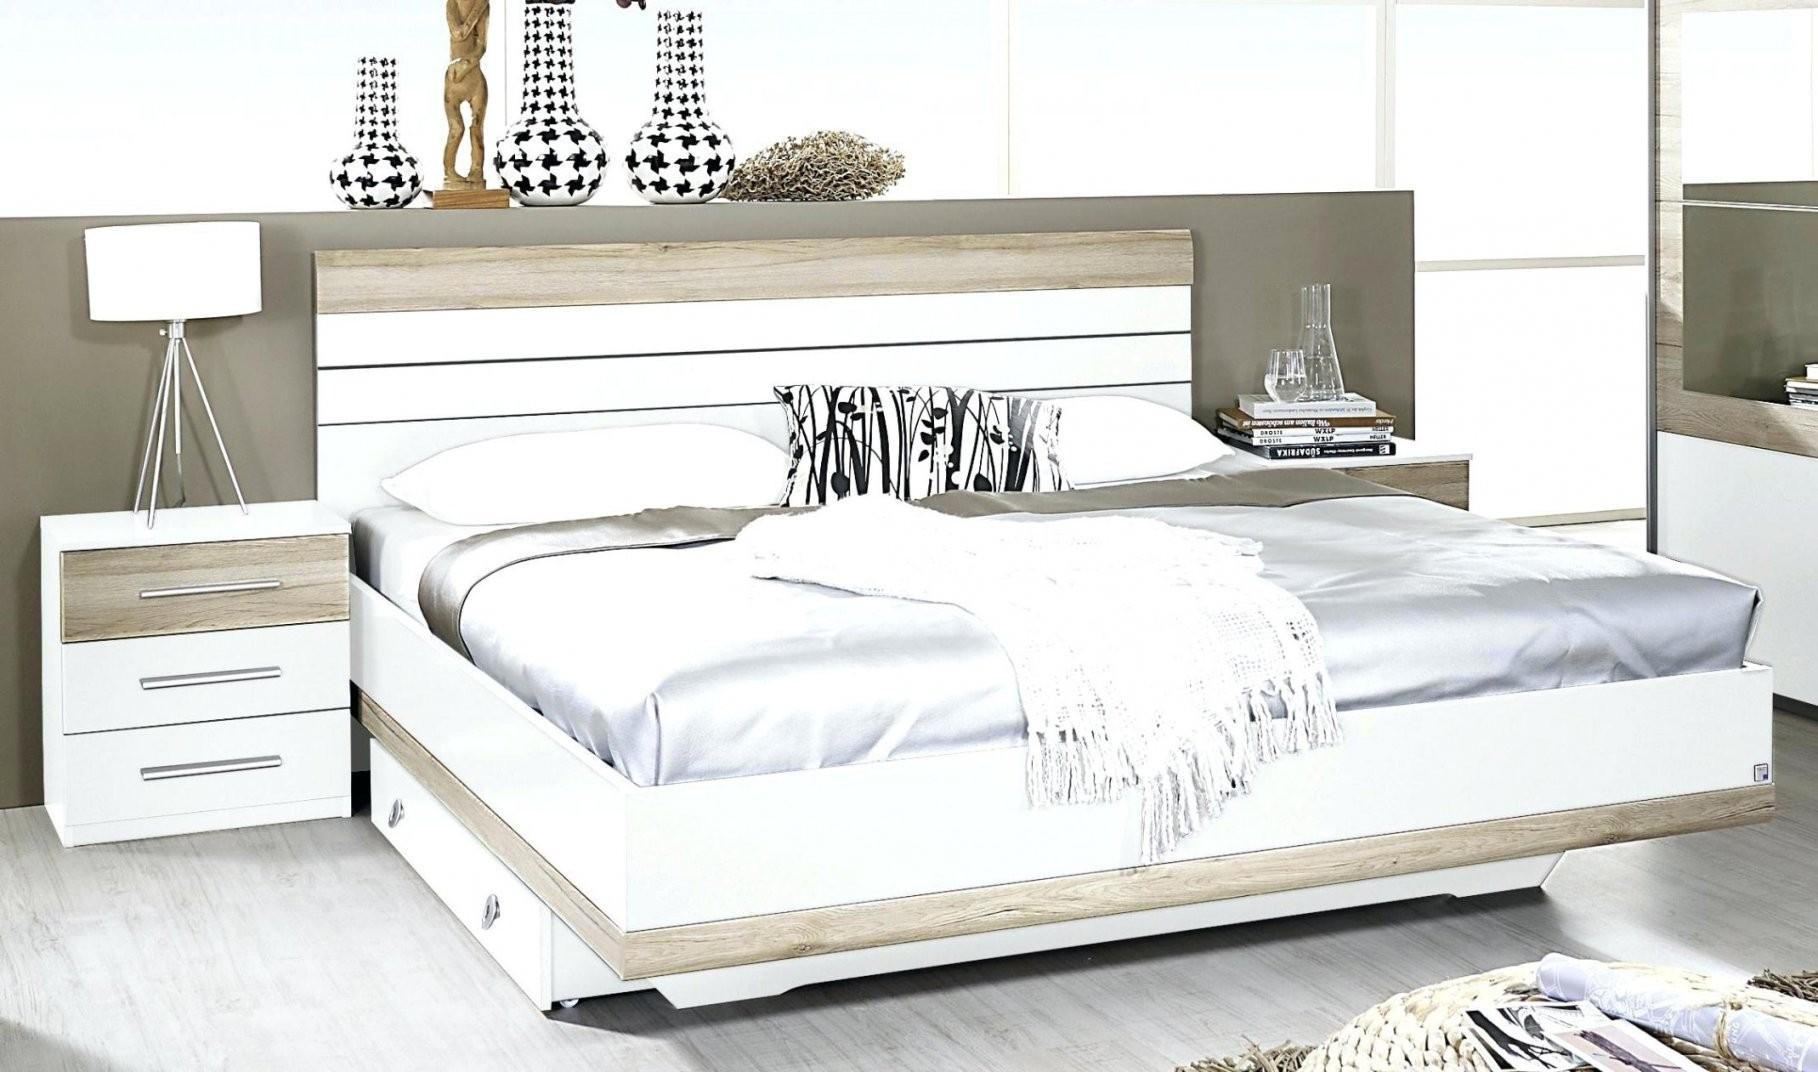 elegantes ikea bett vanvik cool betten 160 200 ikea gebraucht malm von bett 160x200 gebraucht. Black Bedroom Furniture Sets. Home Design Ideas